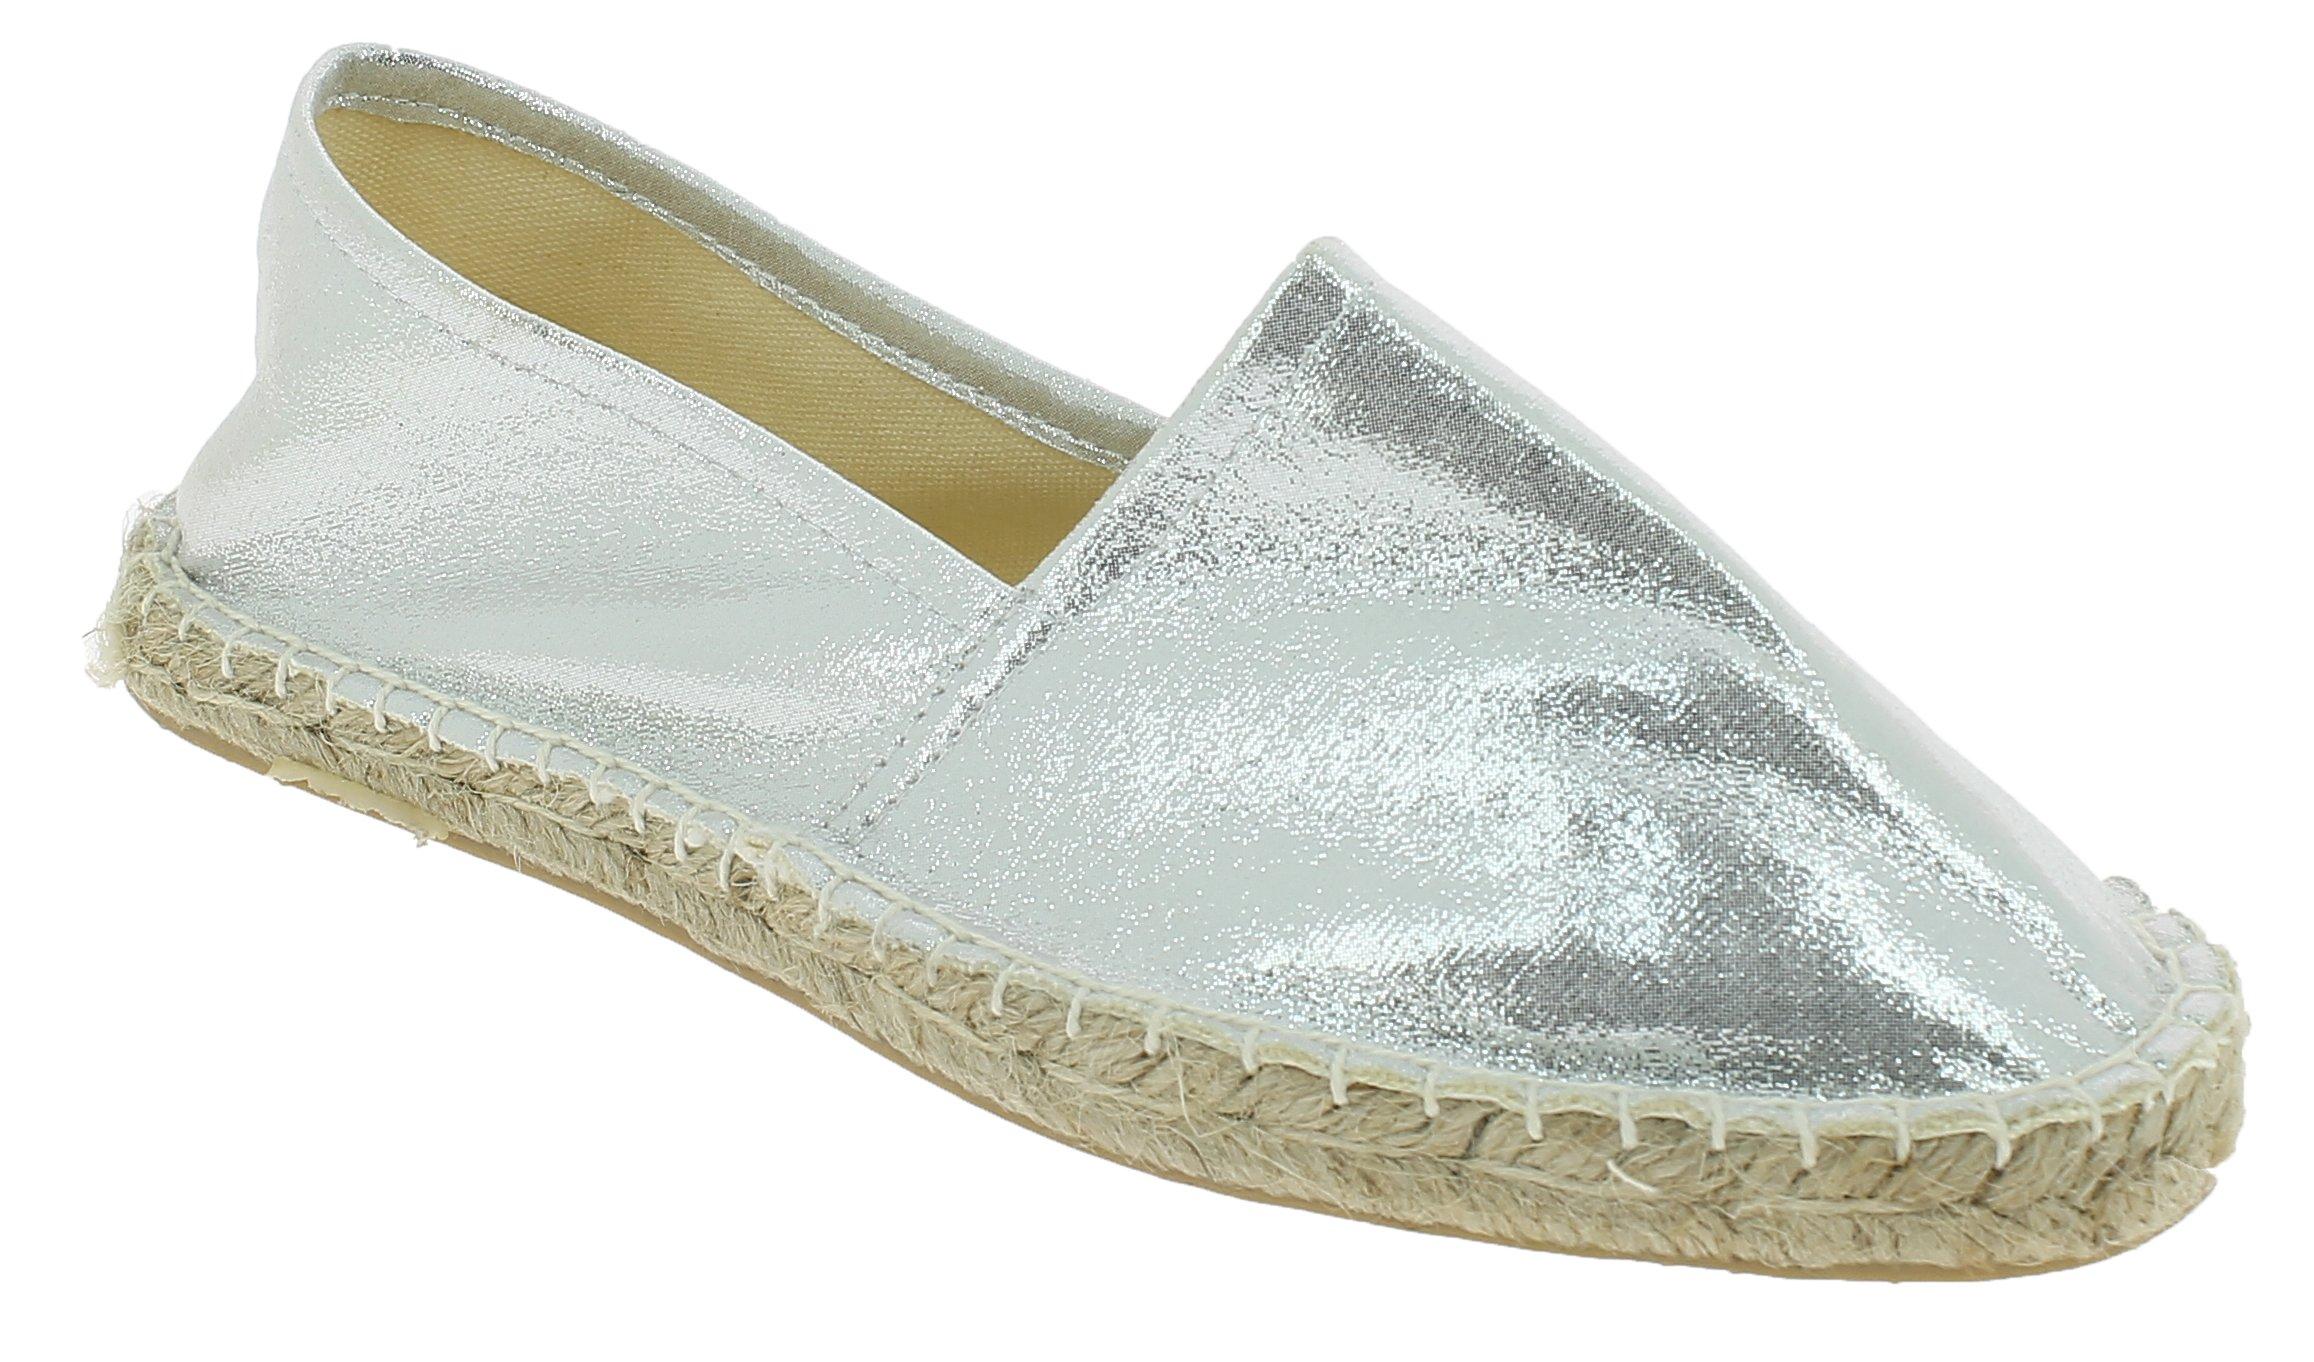 TOPWAY Γυναικείο Casual B702321 Ασημί - IqShoes - B702321 silver 37/1/35/27 παπούτσια  προσφορεσ